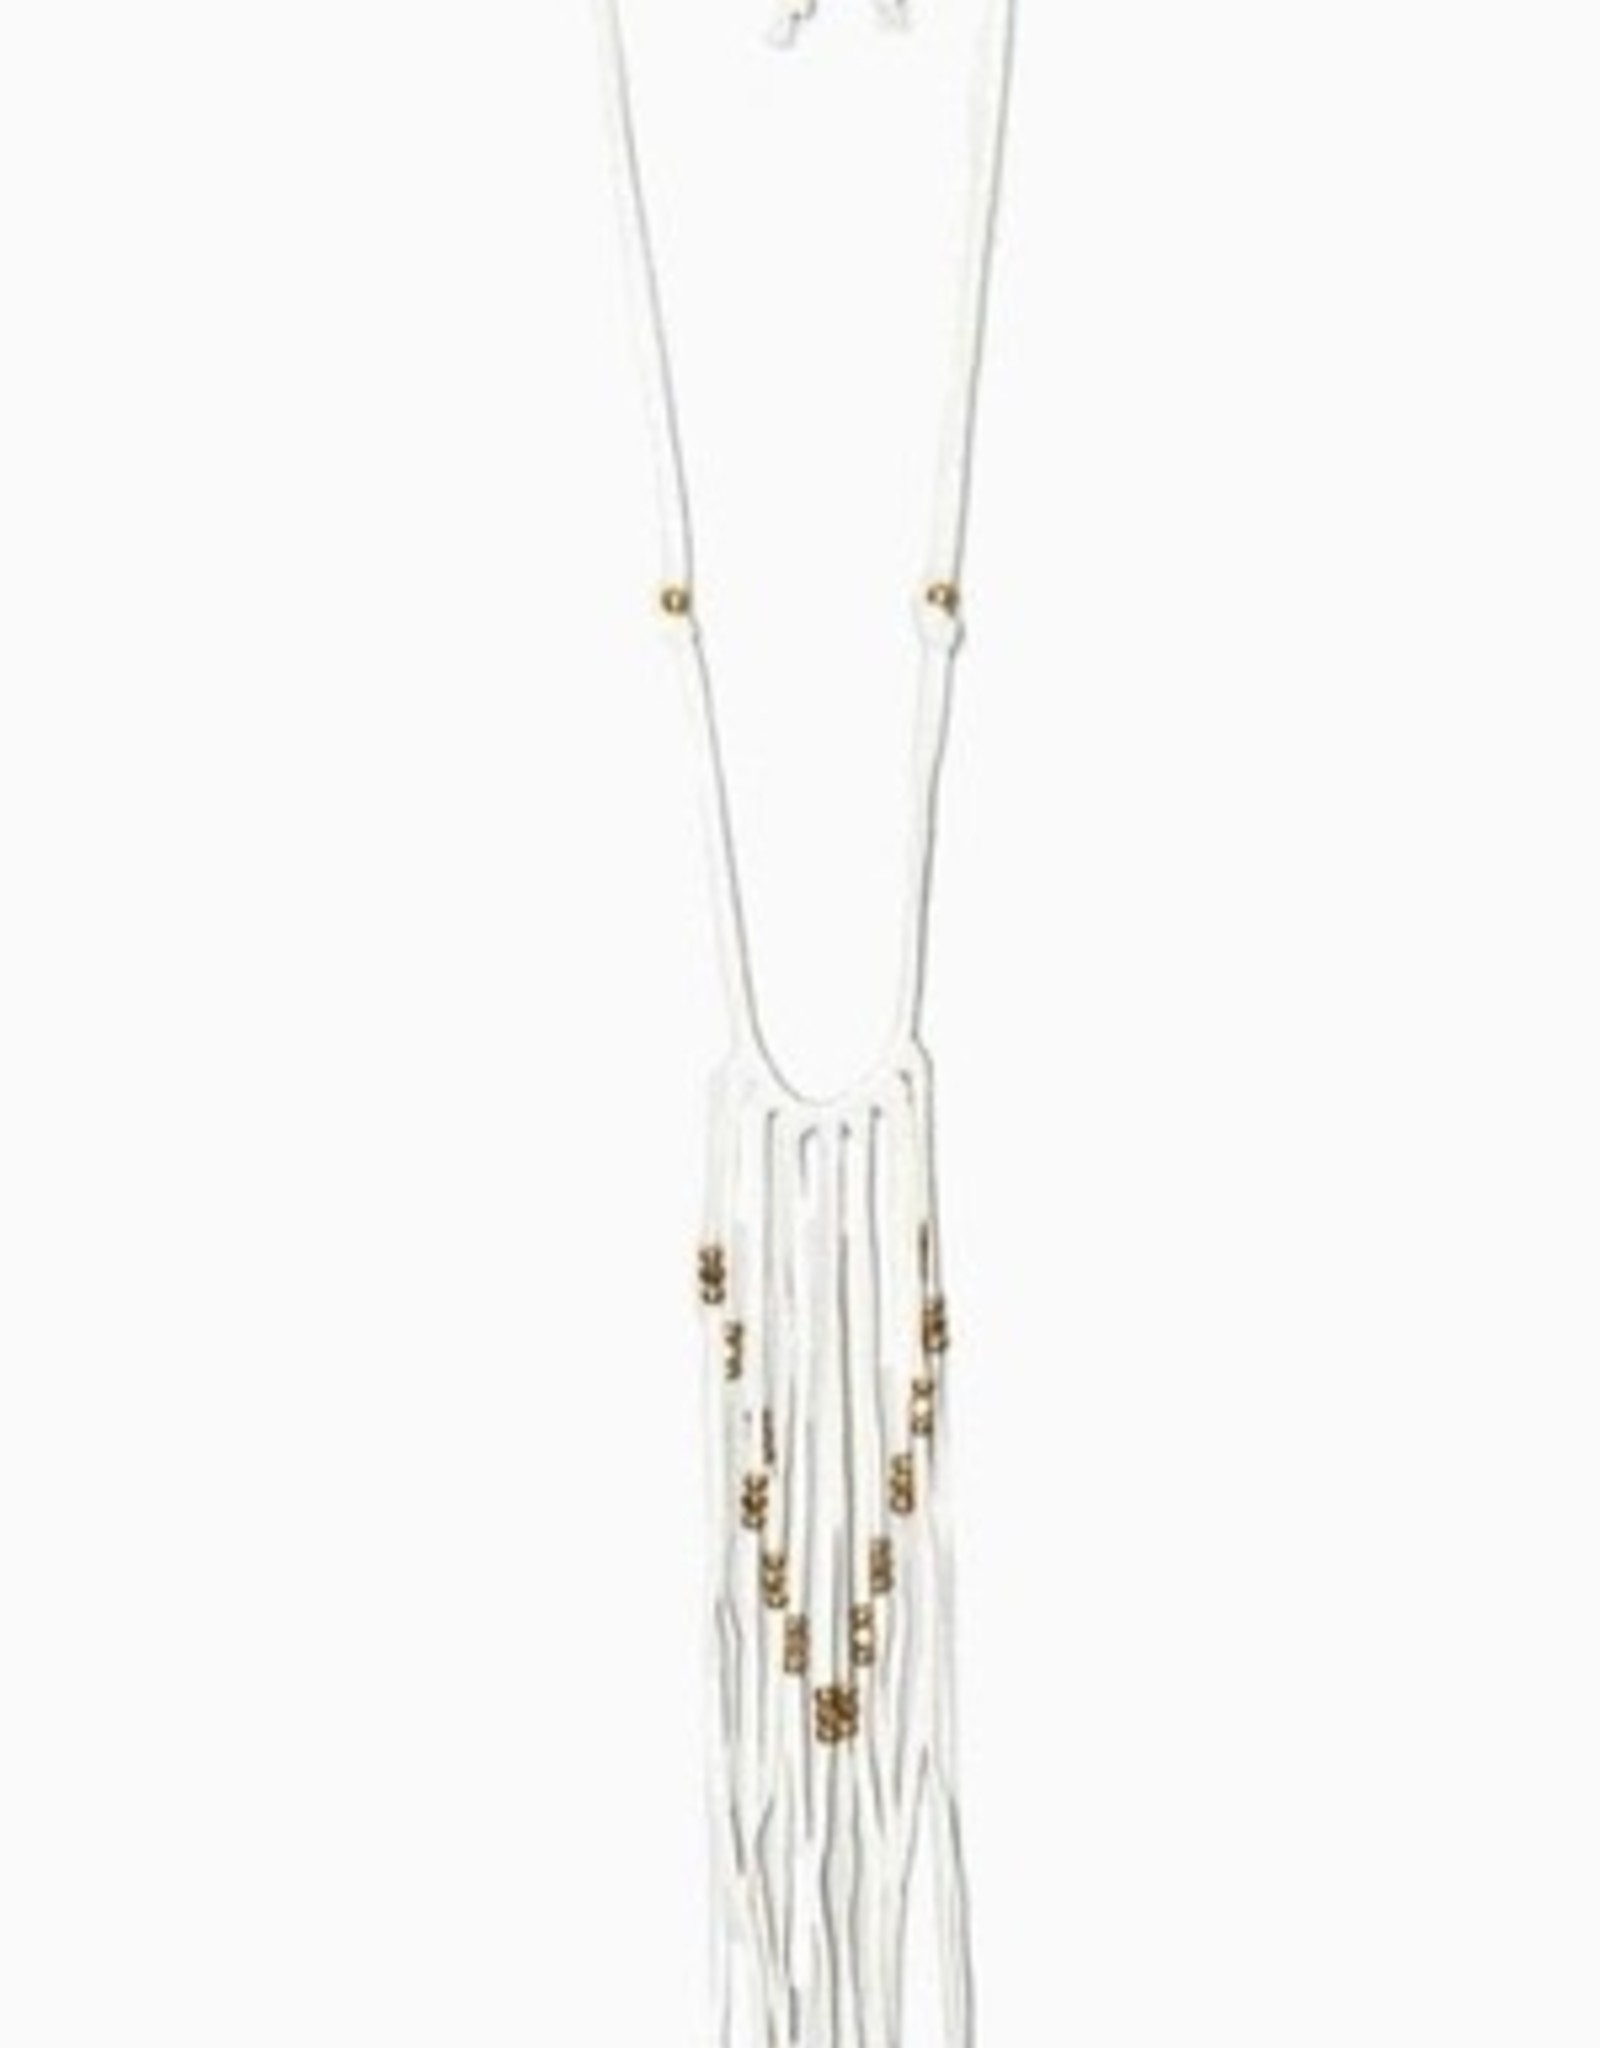 Necklaces Turquoise & Tobacco - Deer Skin Leather Fringe Necklace